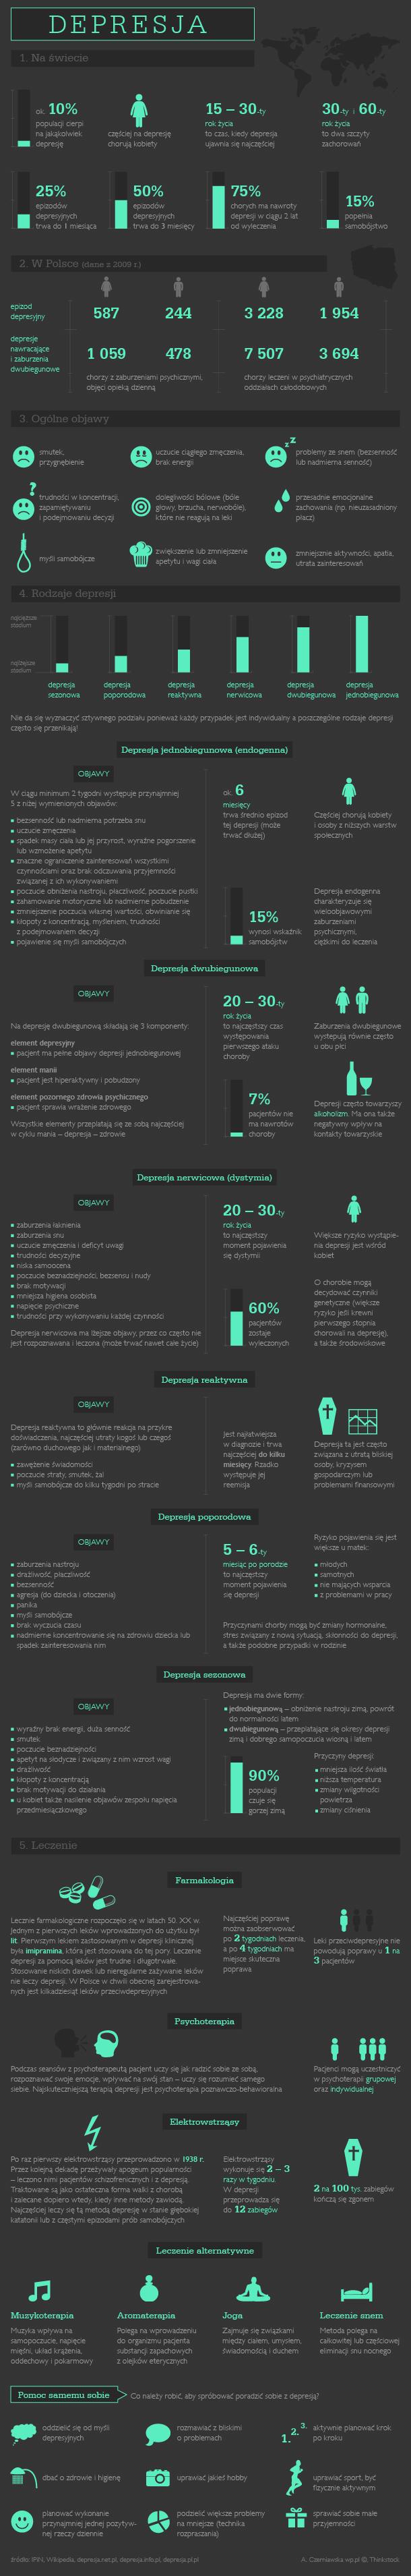 depresja_infografika_610.jpeg